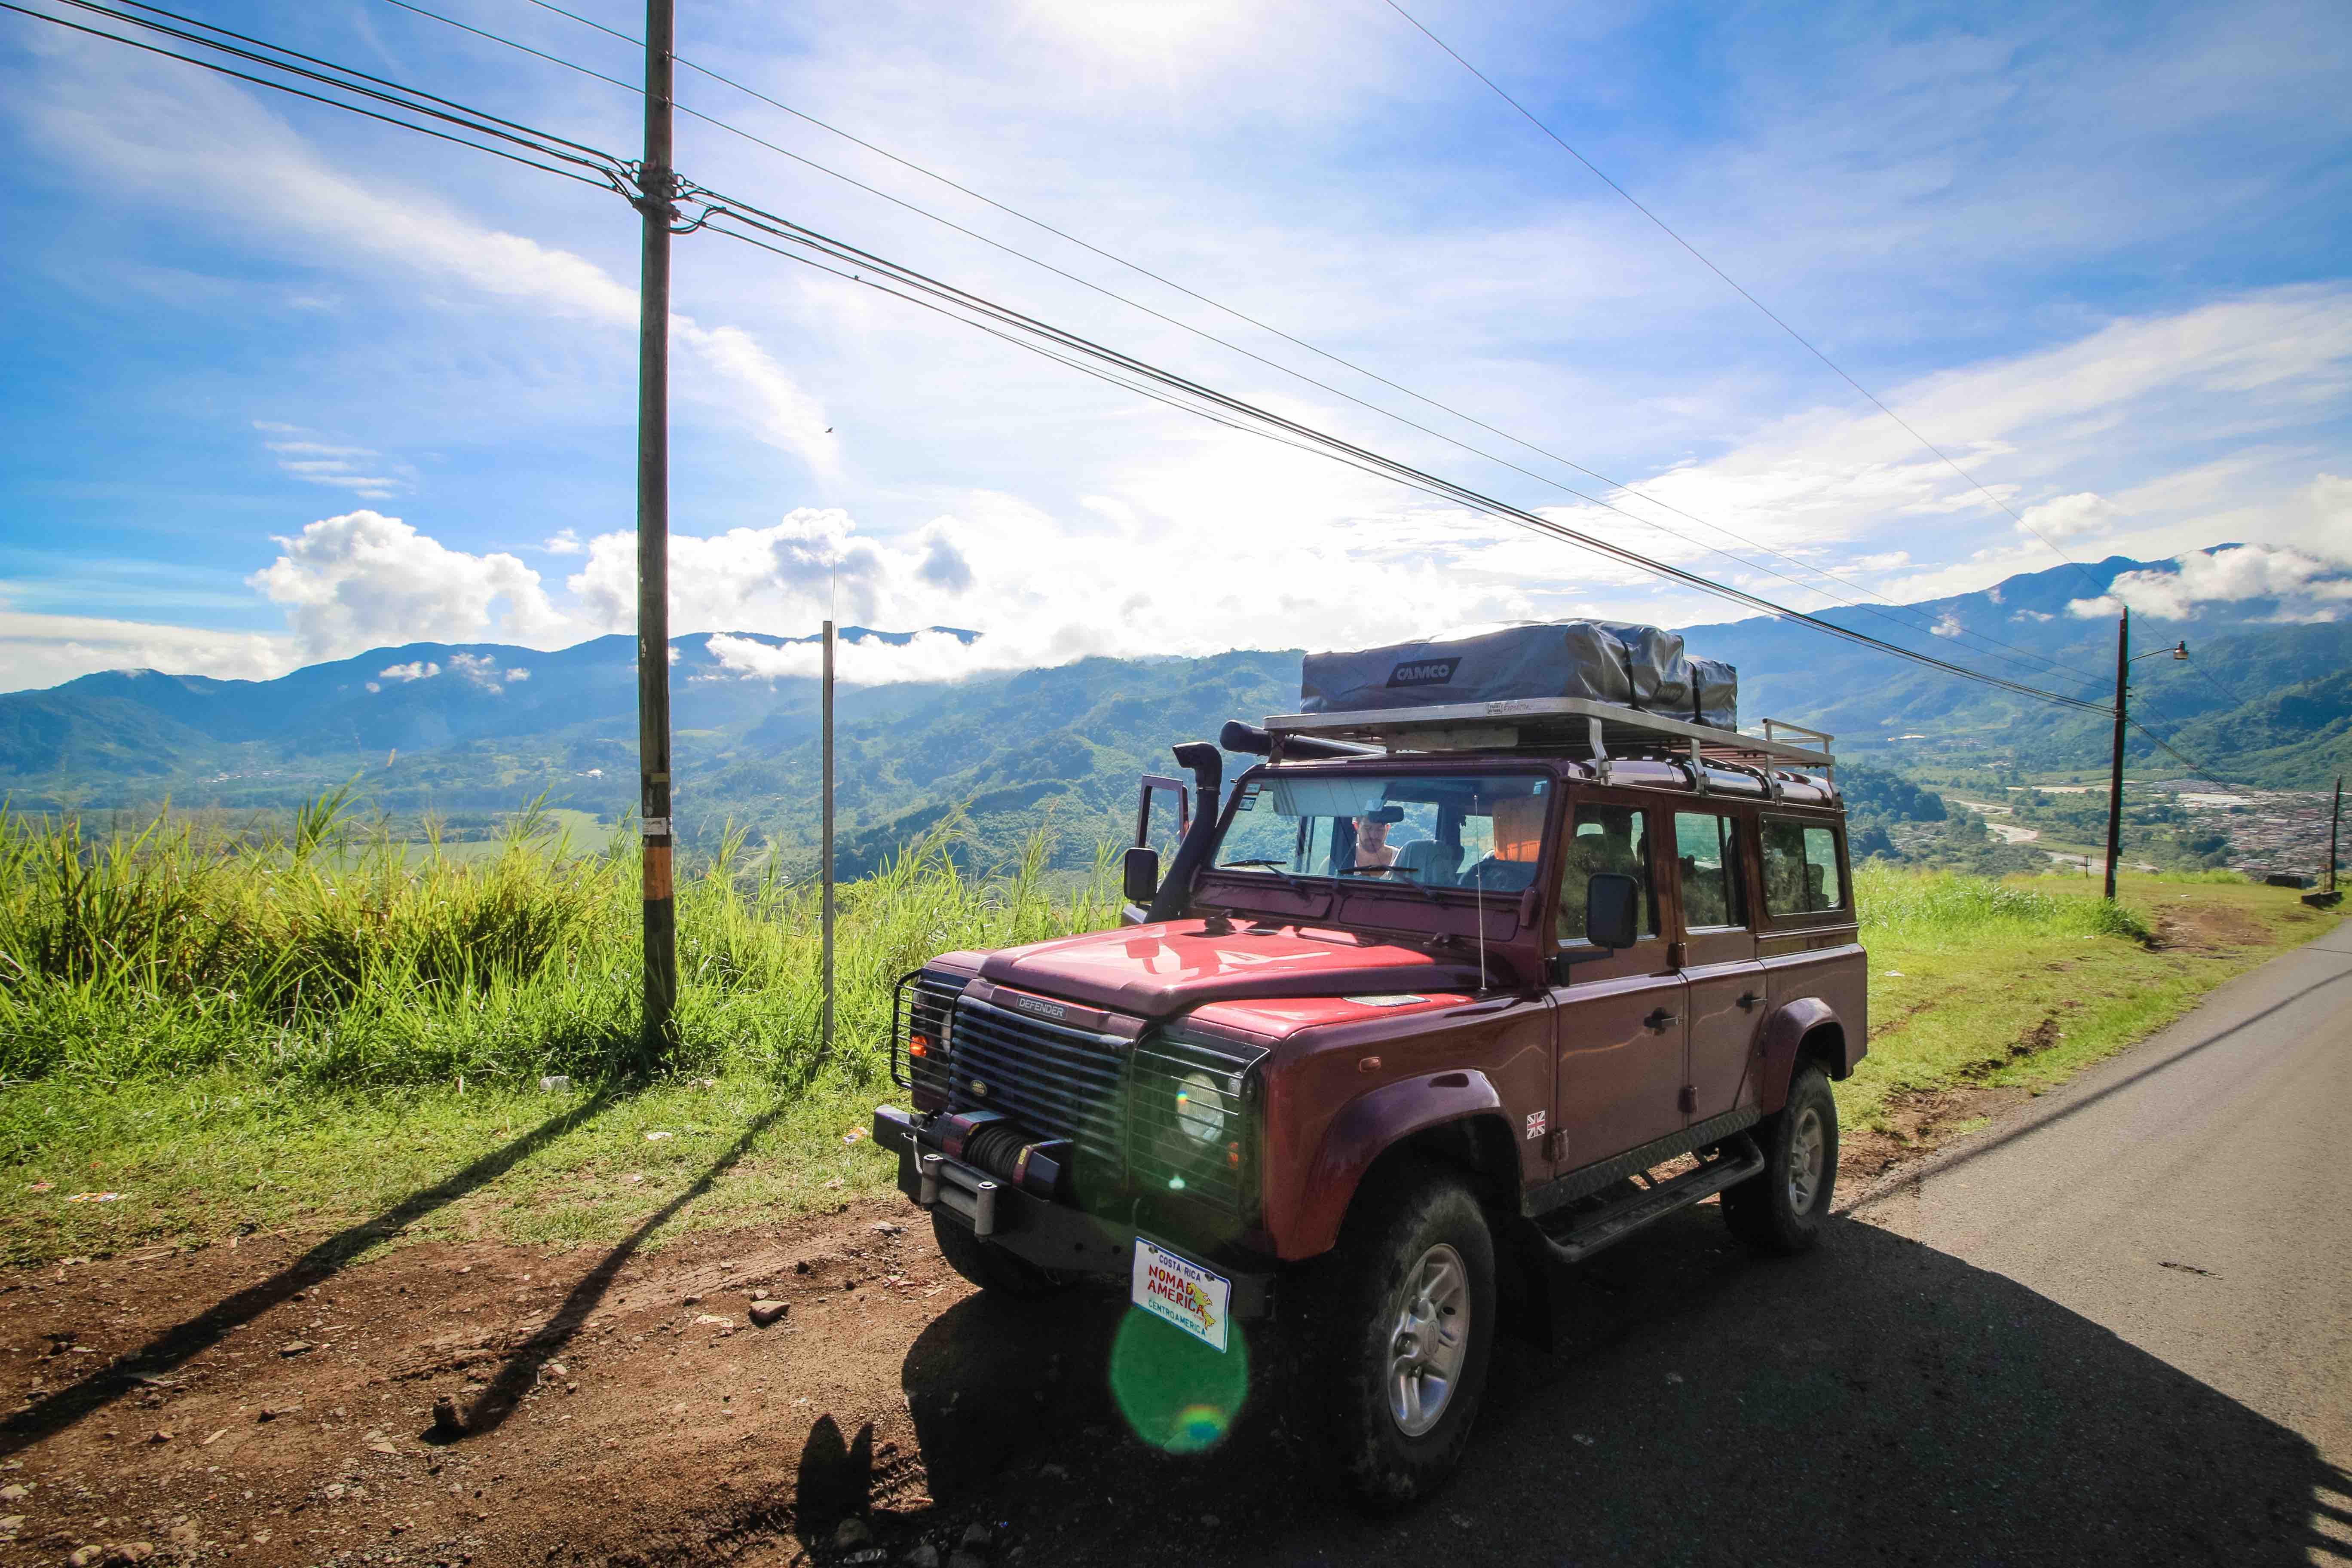 Defender 110 2018 >> Land Rover Defender 110 - Nomad America 4x4 Car Rental Costa Rica